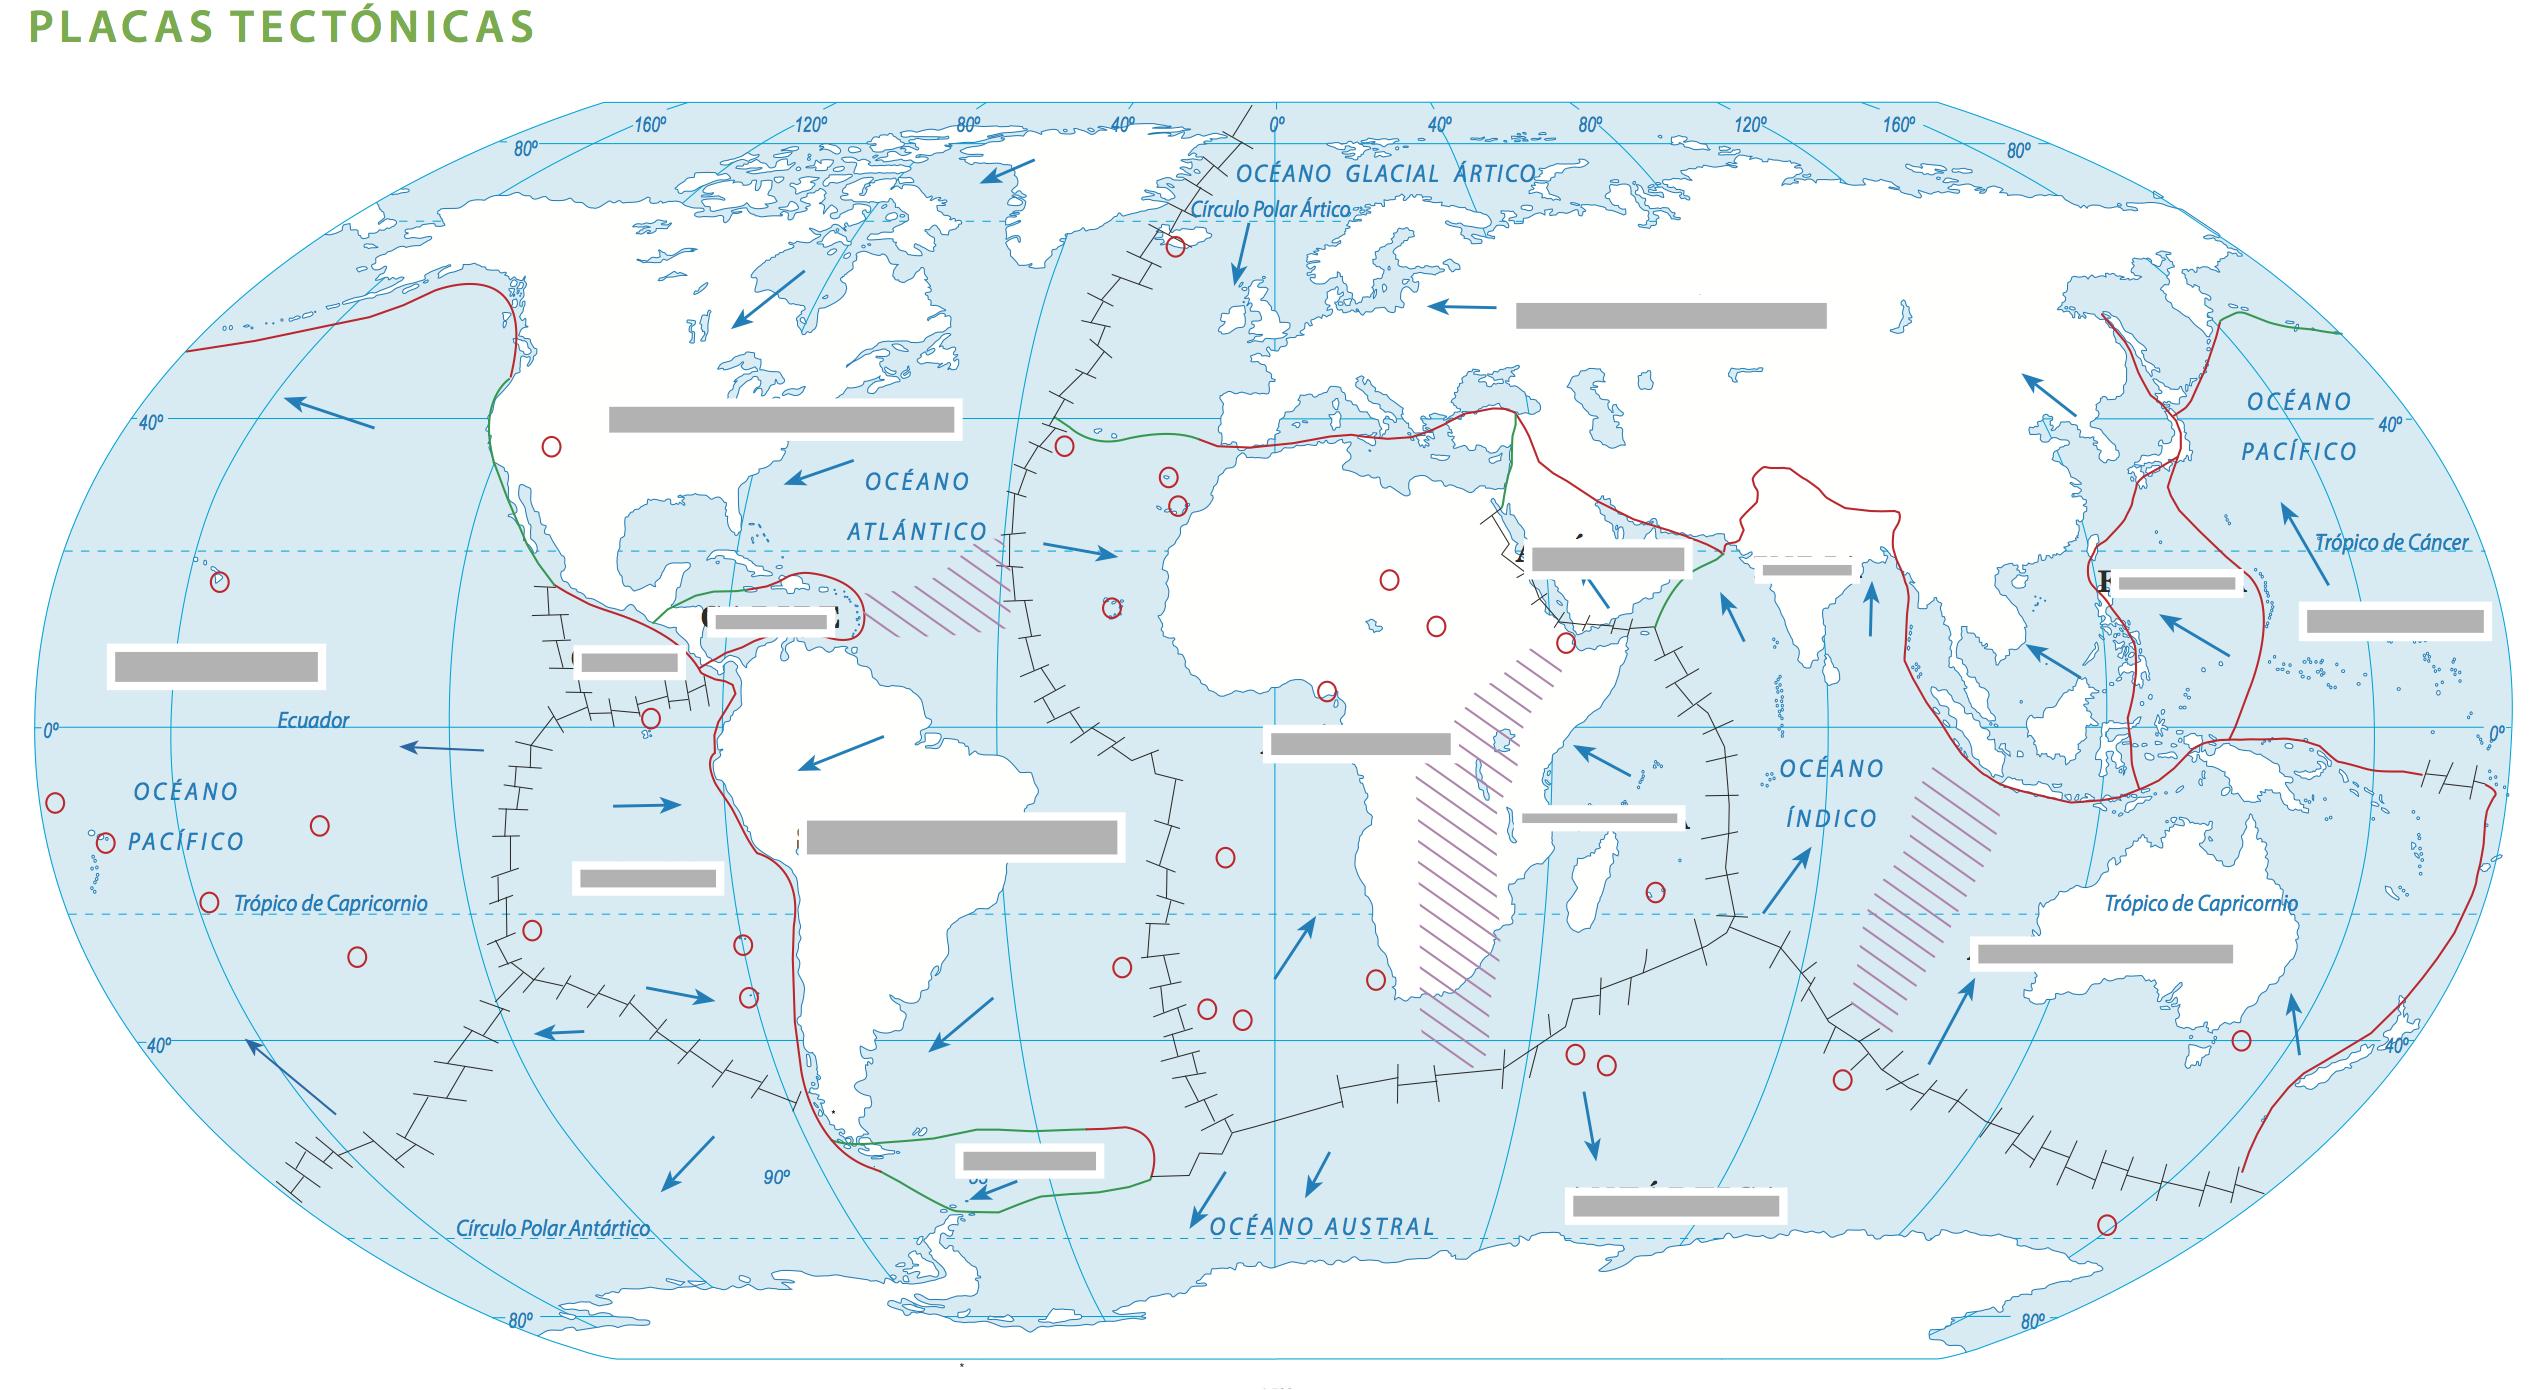 Mapa Mudo Placas Tectonicas